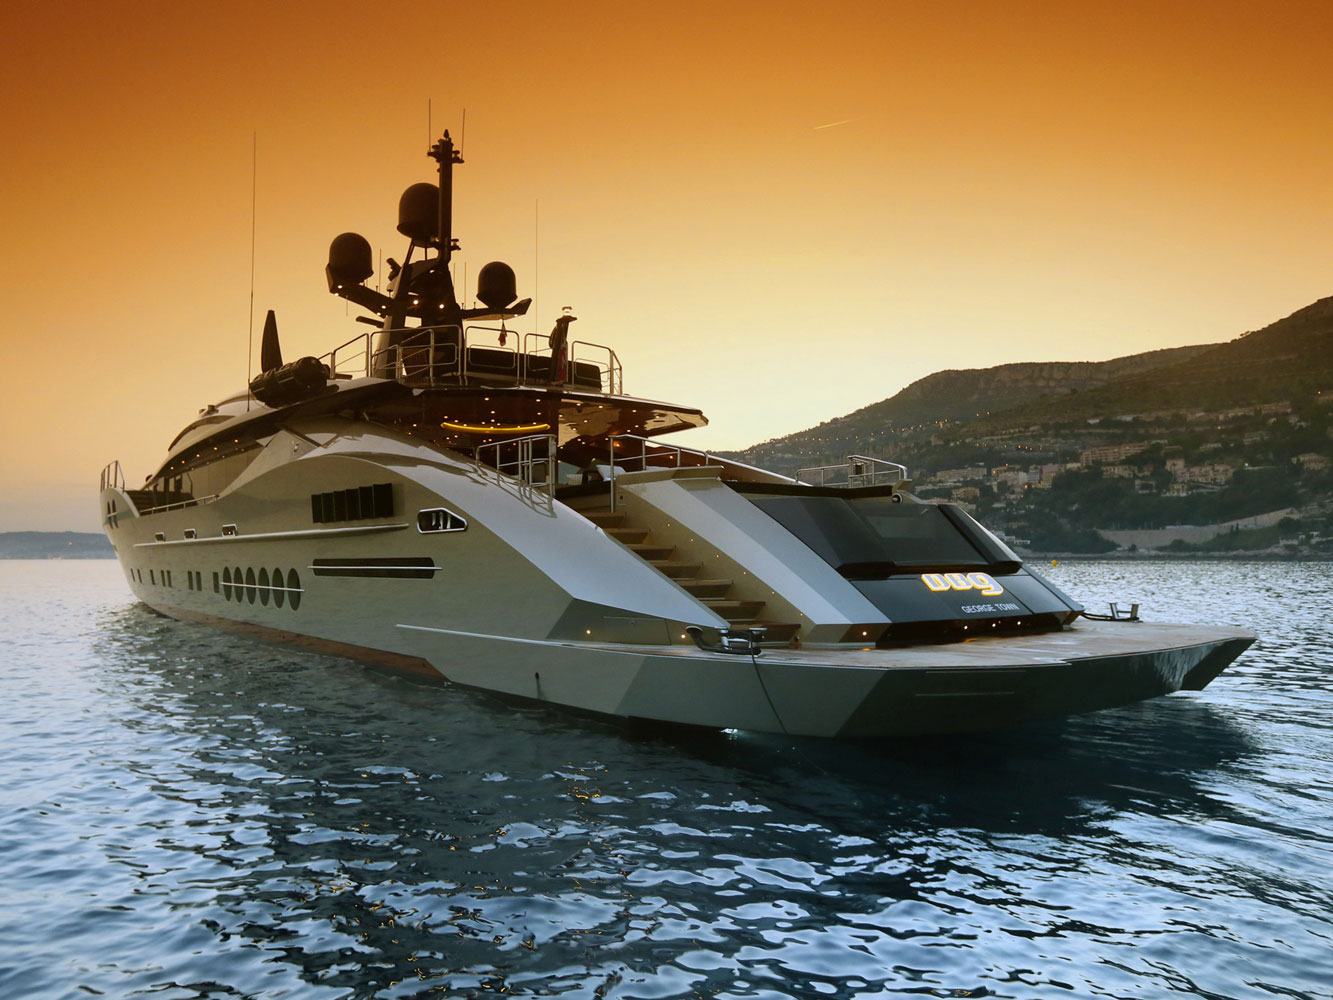 Another Palmer Johnson Yacht At Sunset - PJ 170